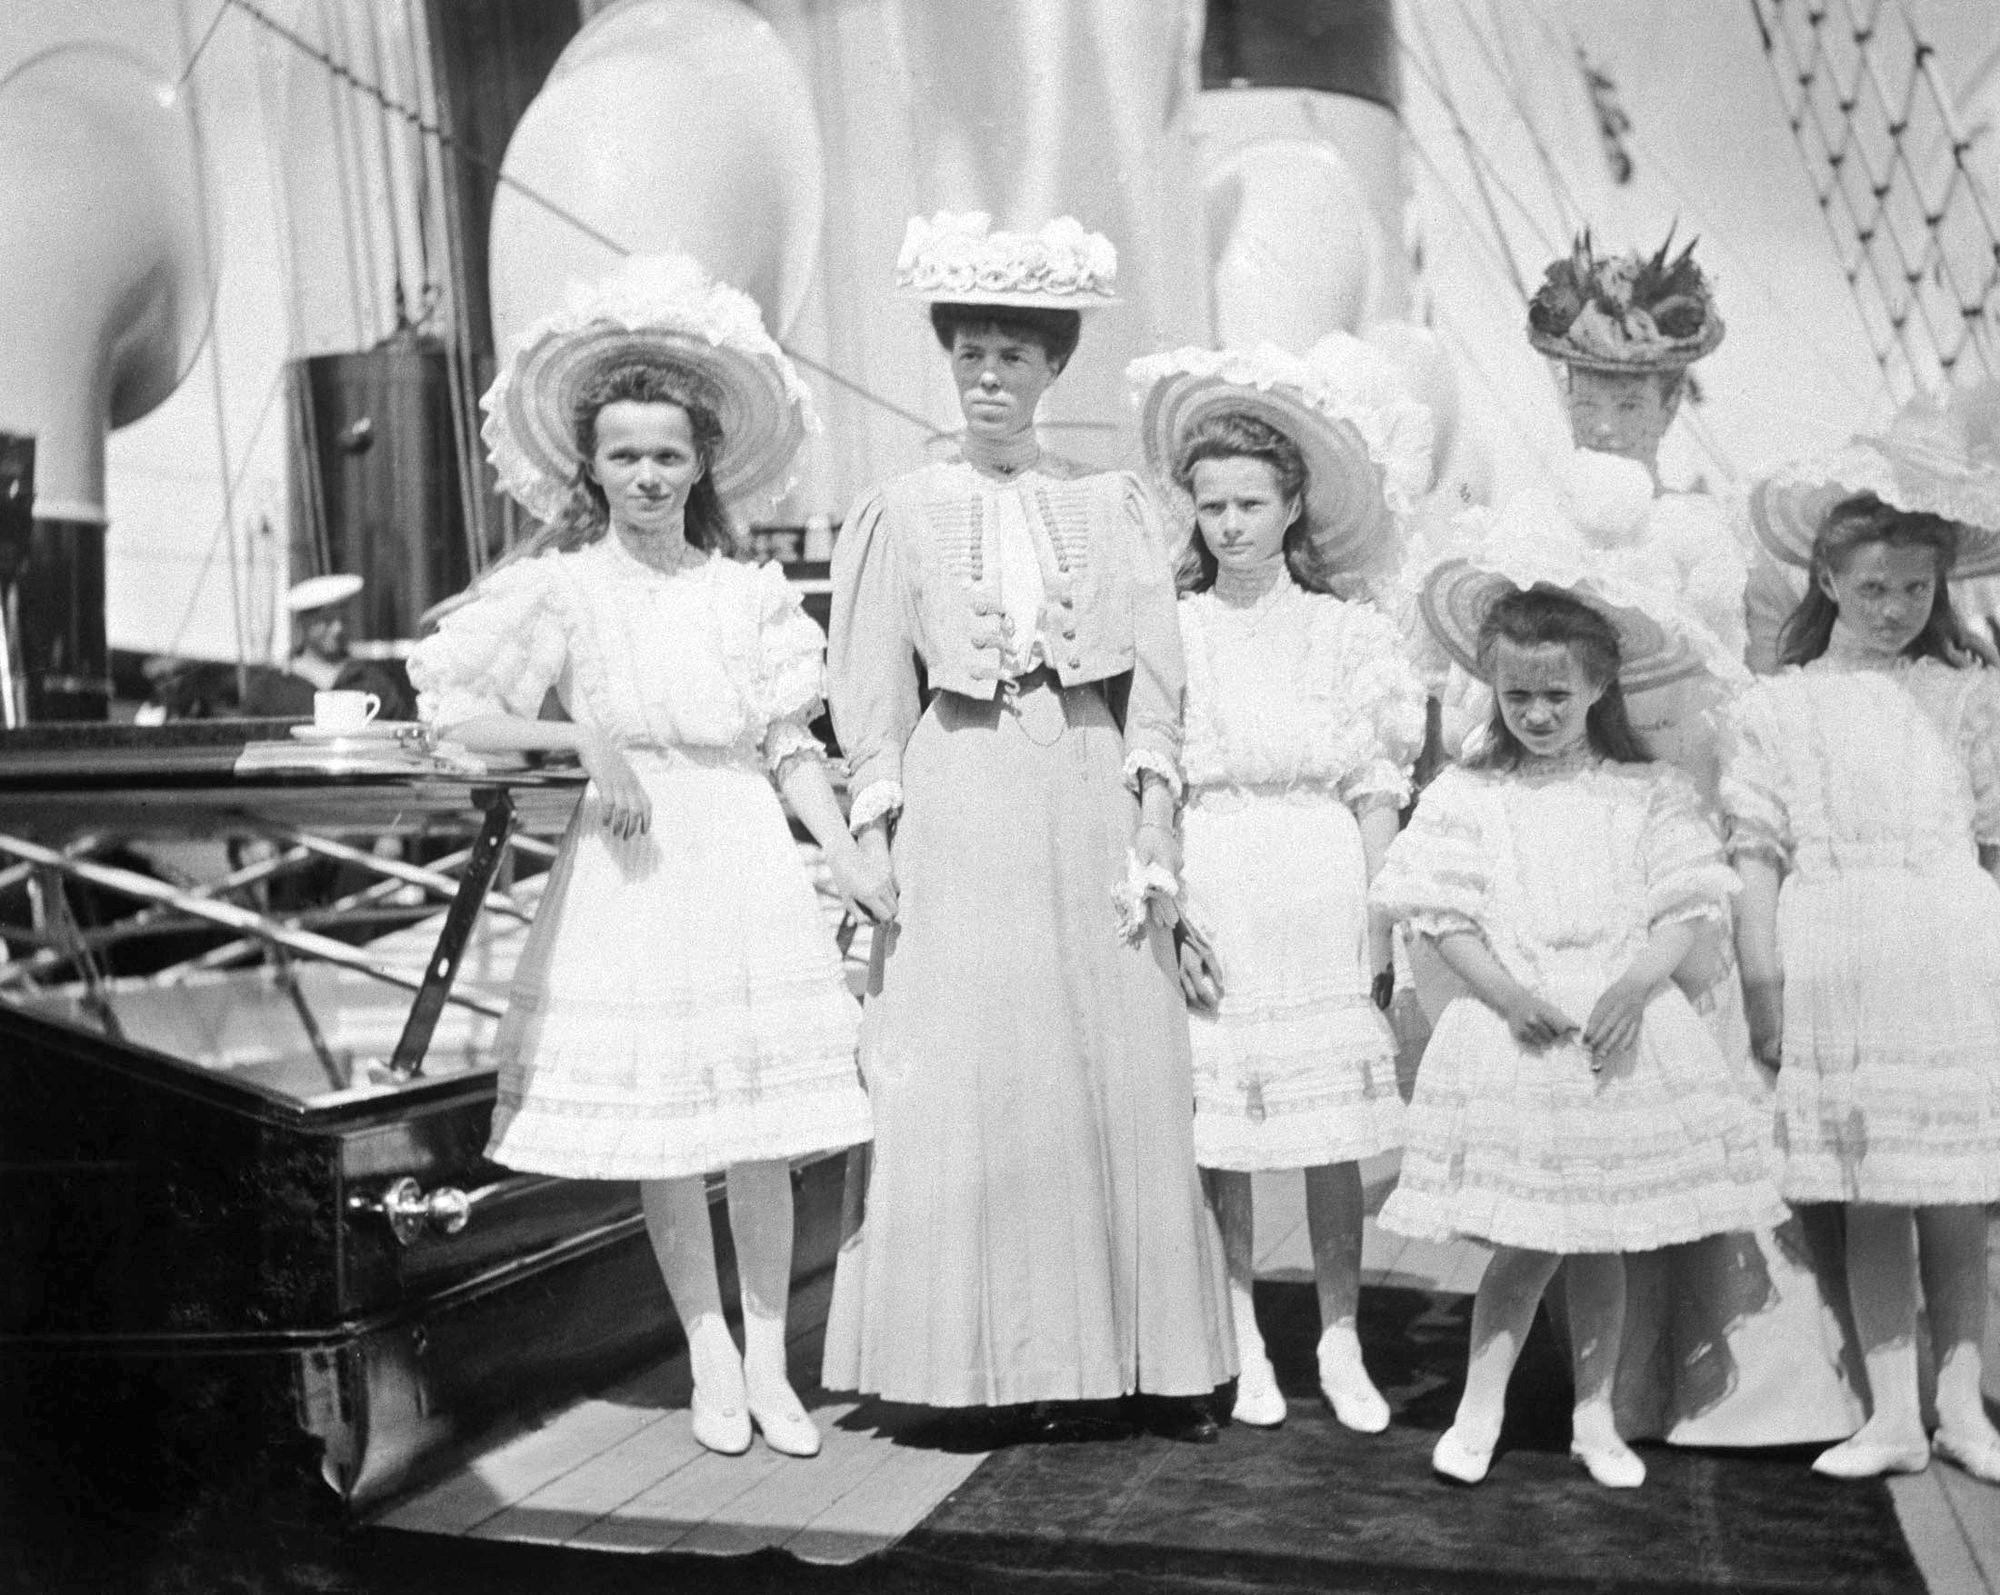 Nicholas II - the last Russian tsar from the Romanov dynasty 62